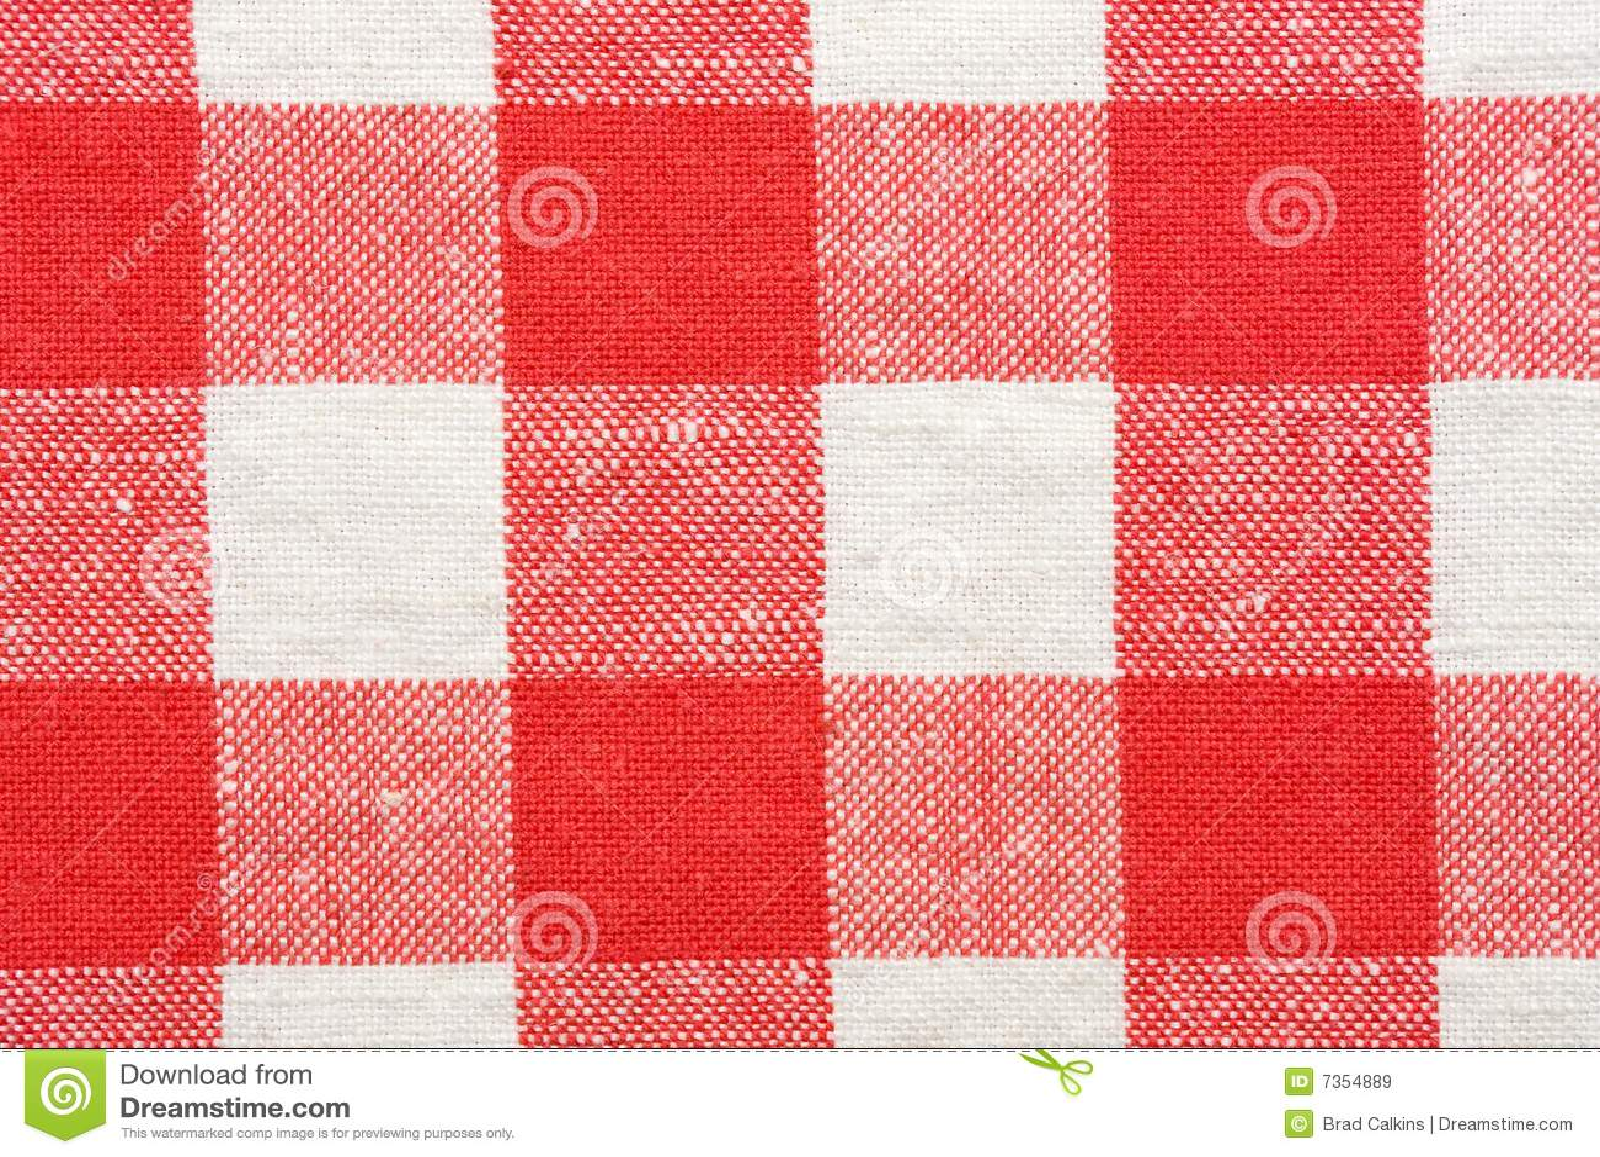 nappe rouge et blanche images libres de droits image 7354889. Black Bedroom Furniture Sets. Home Design Ideas